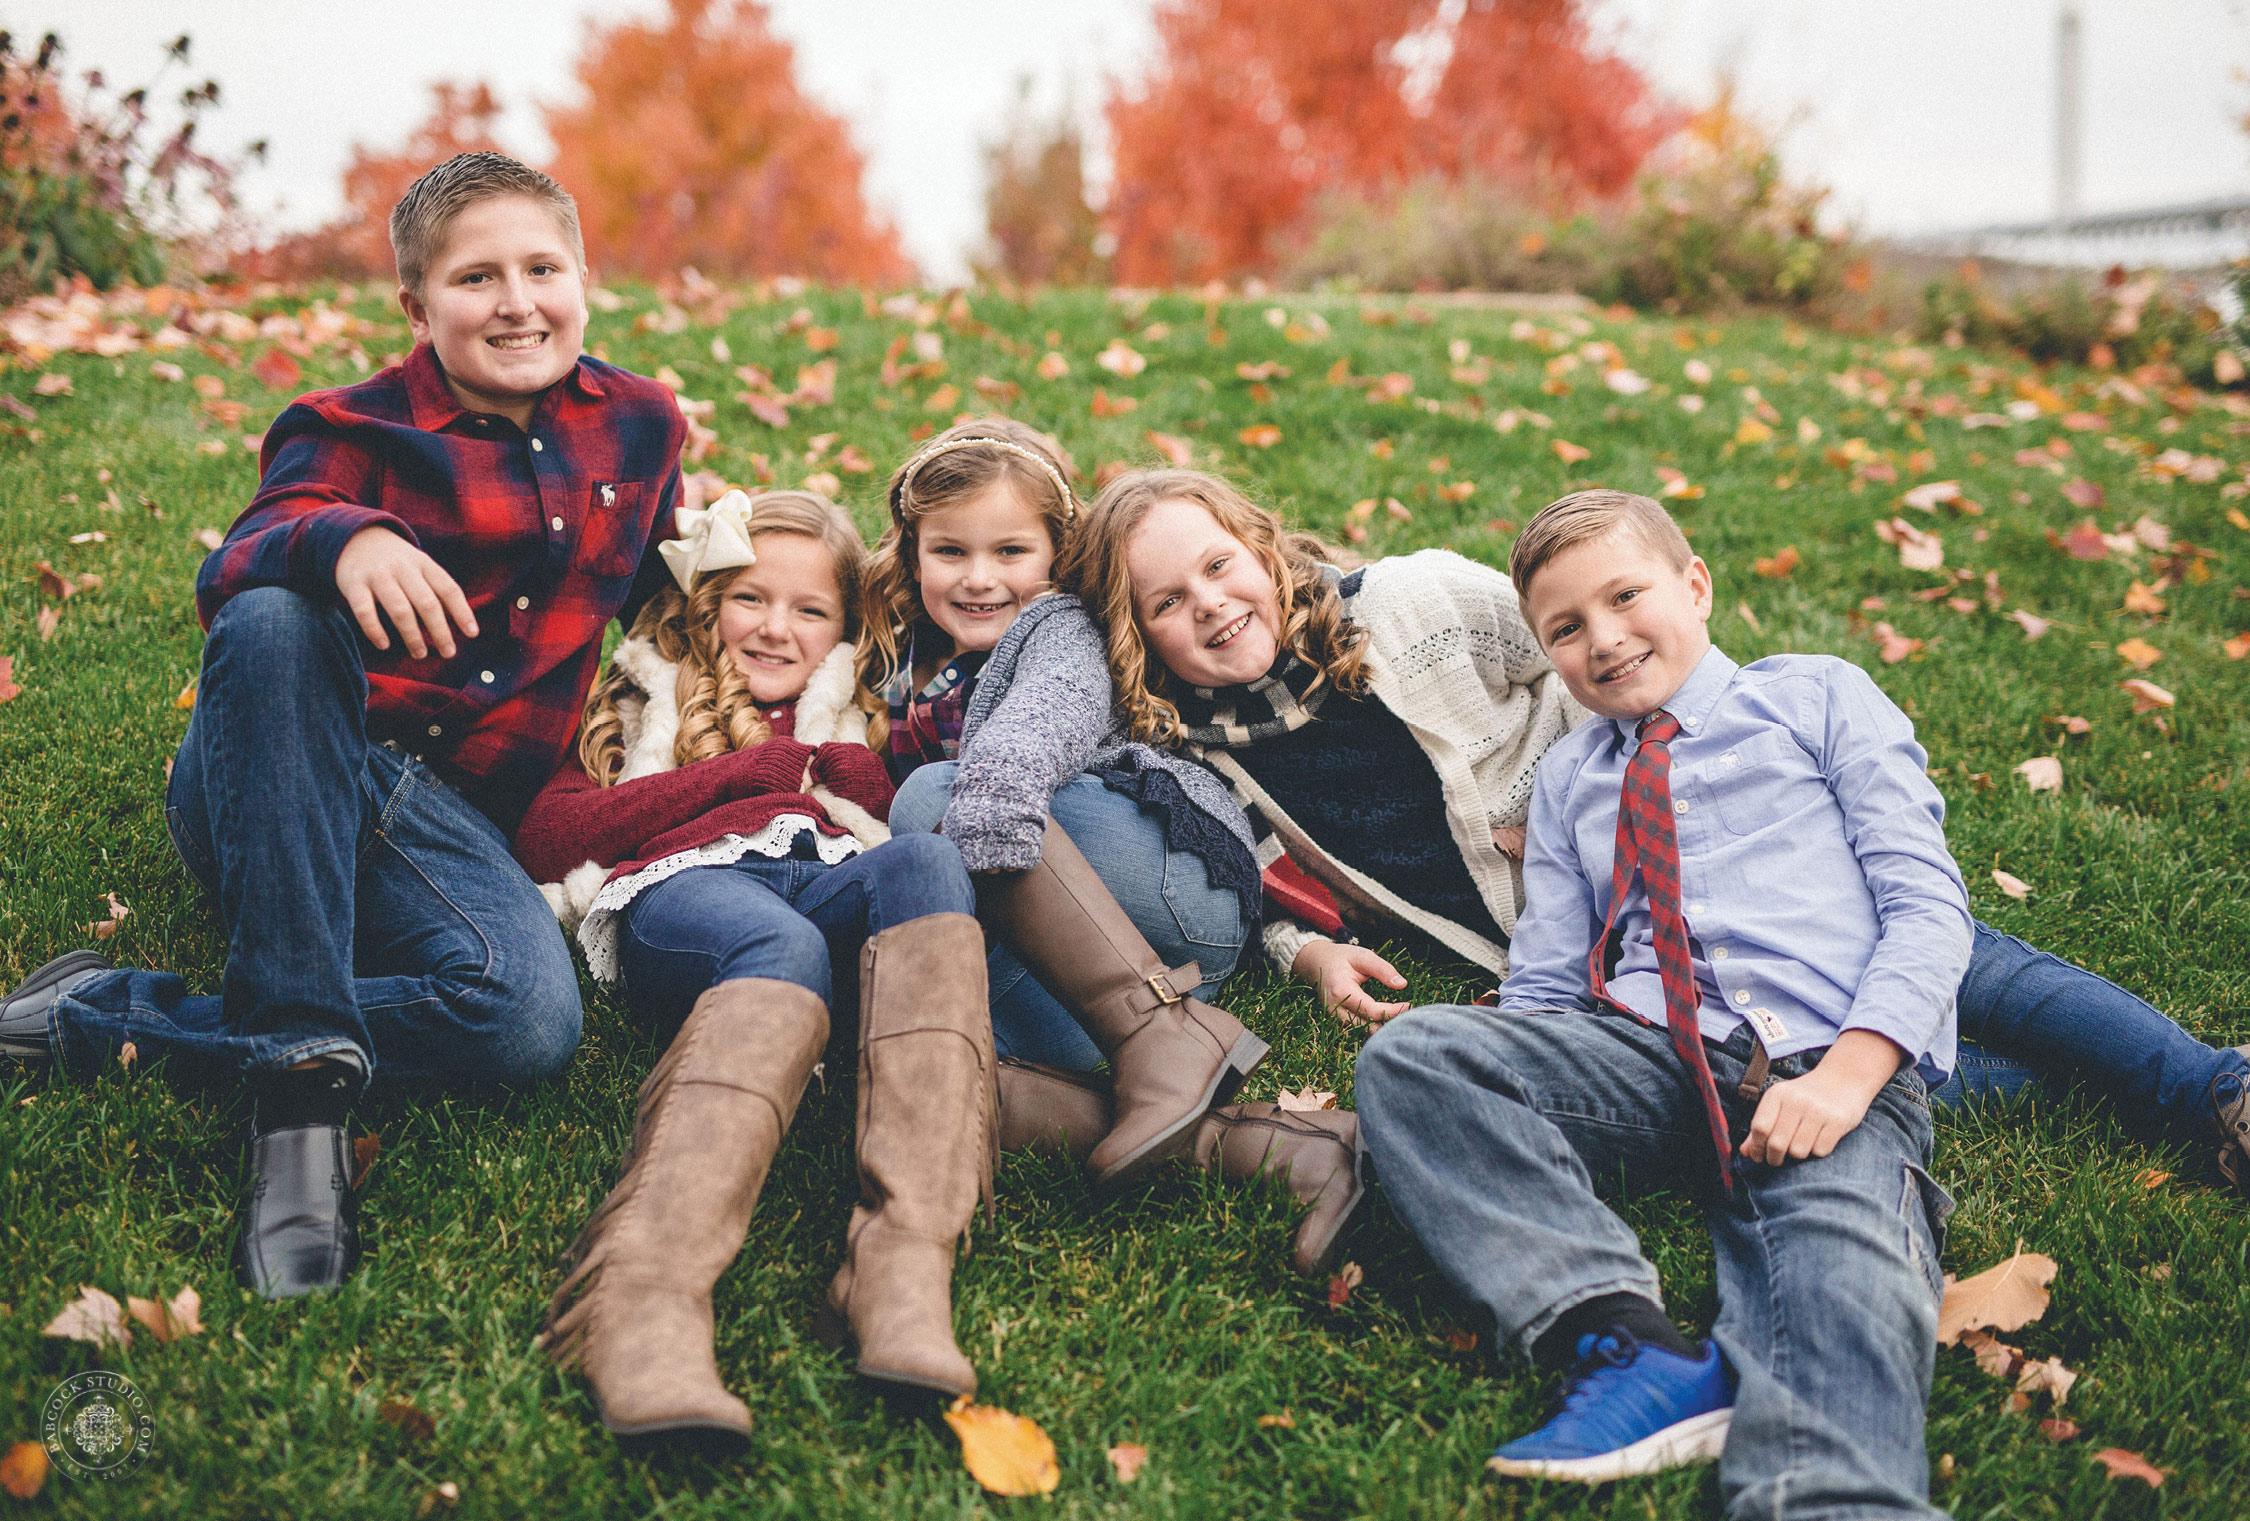 matichel-family-photographer-cincinnati-ohio-9.jpg